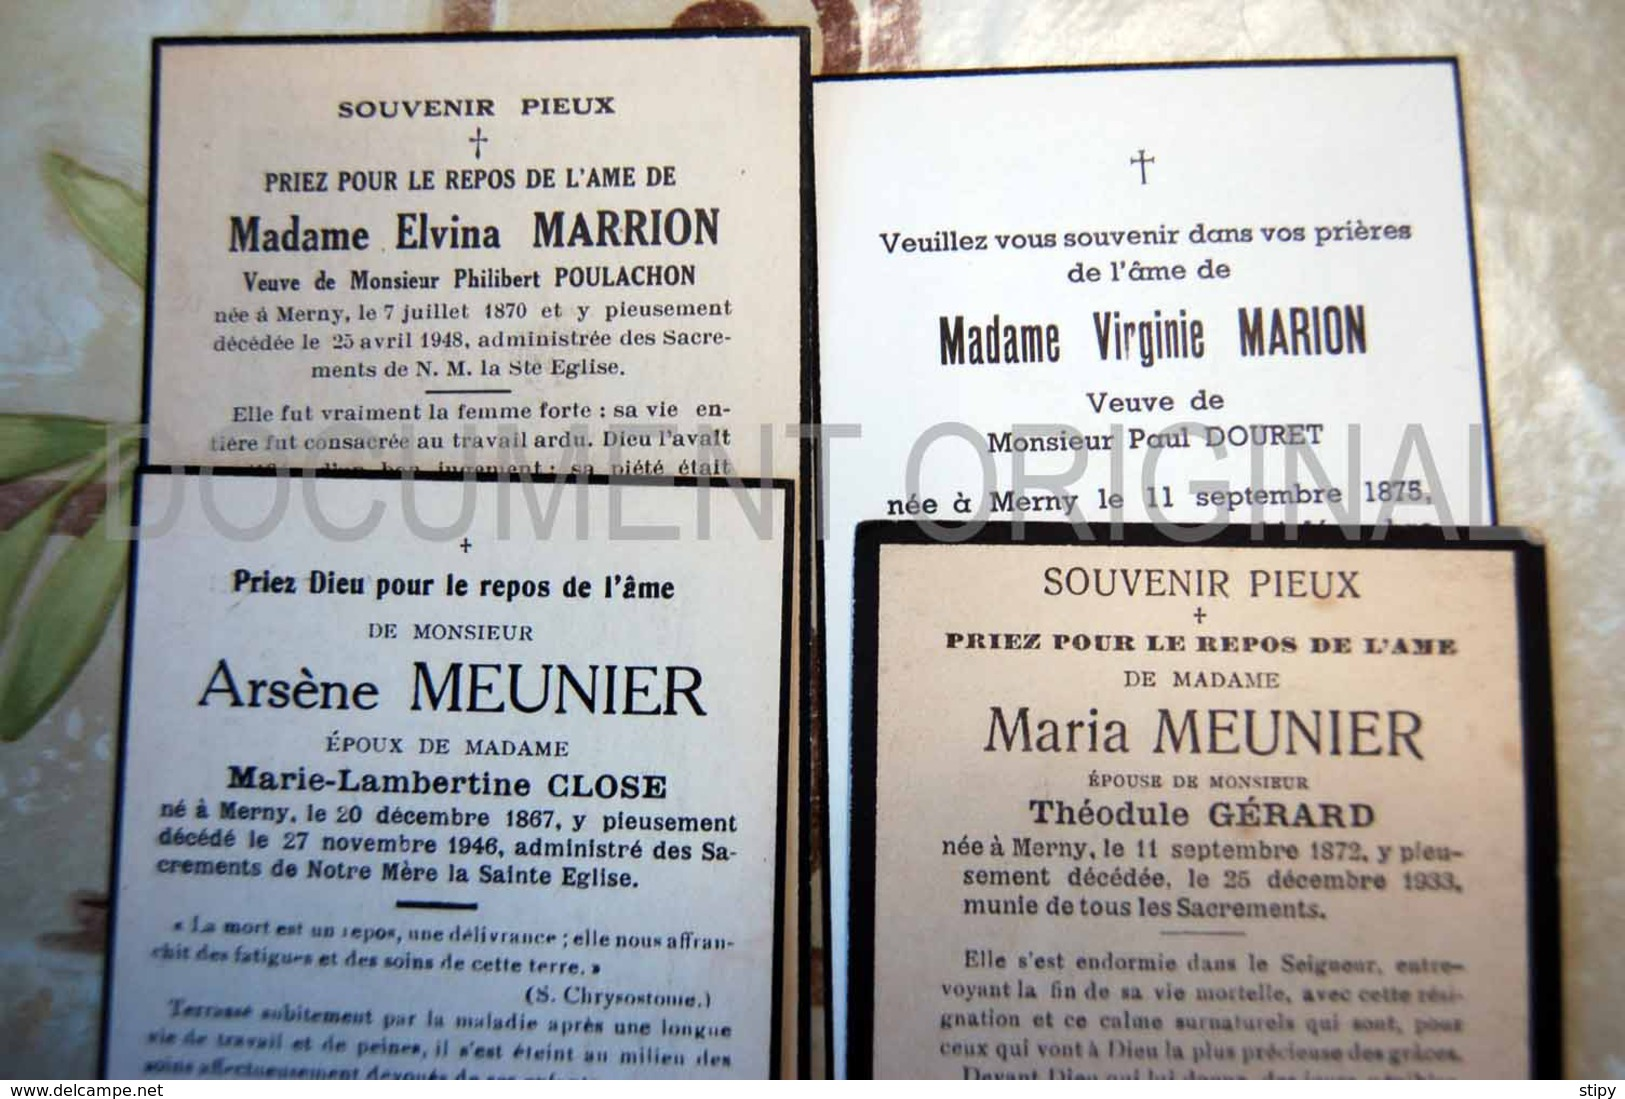 Merny (Paliseul) - Meunier, Marion Marrion - Paliseul